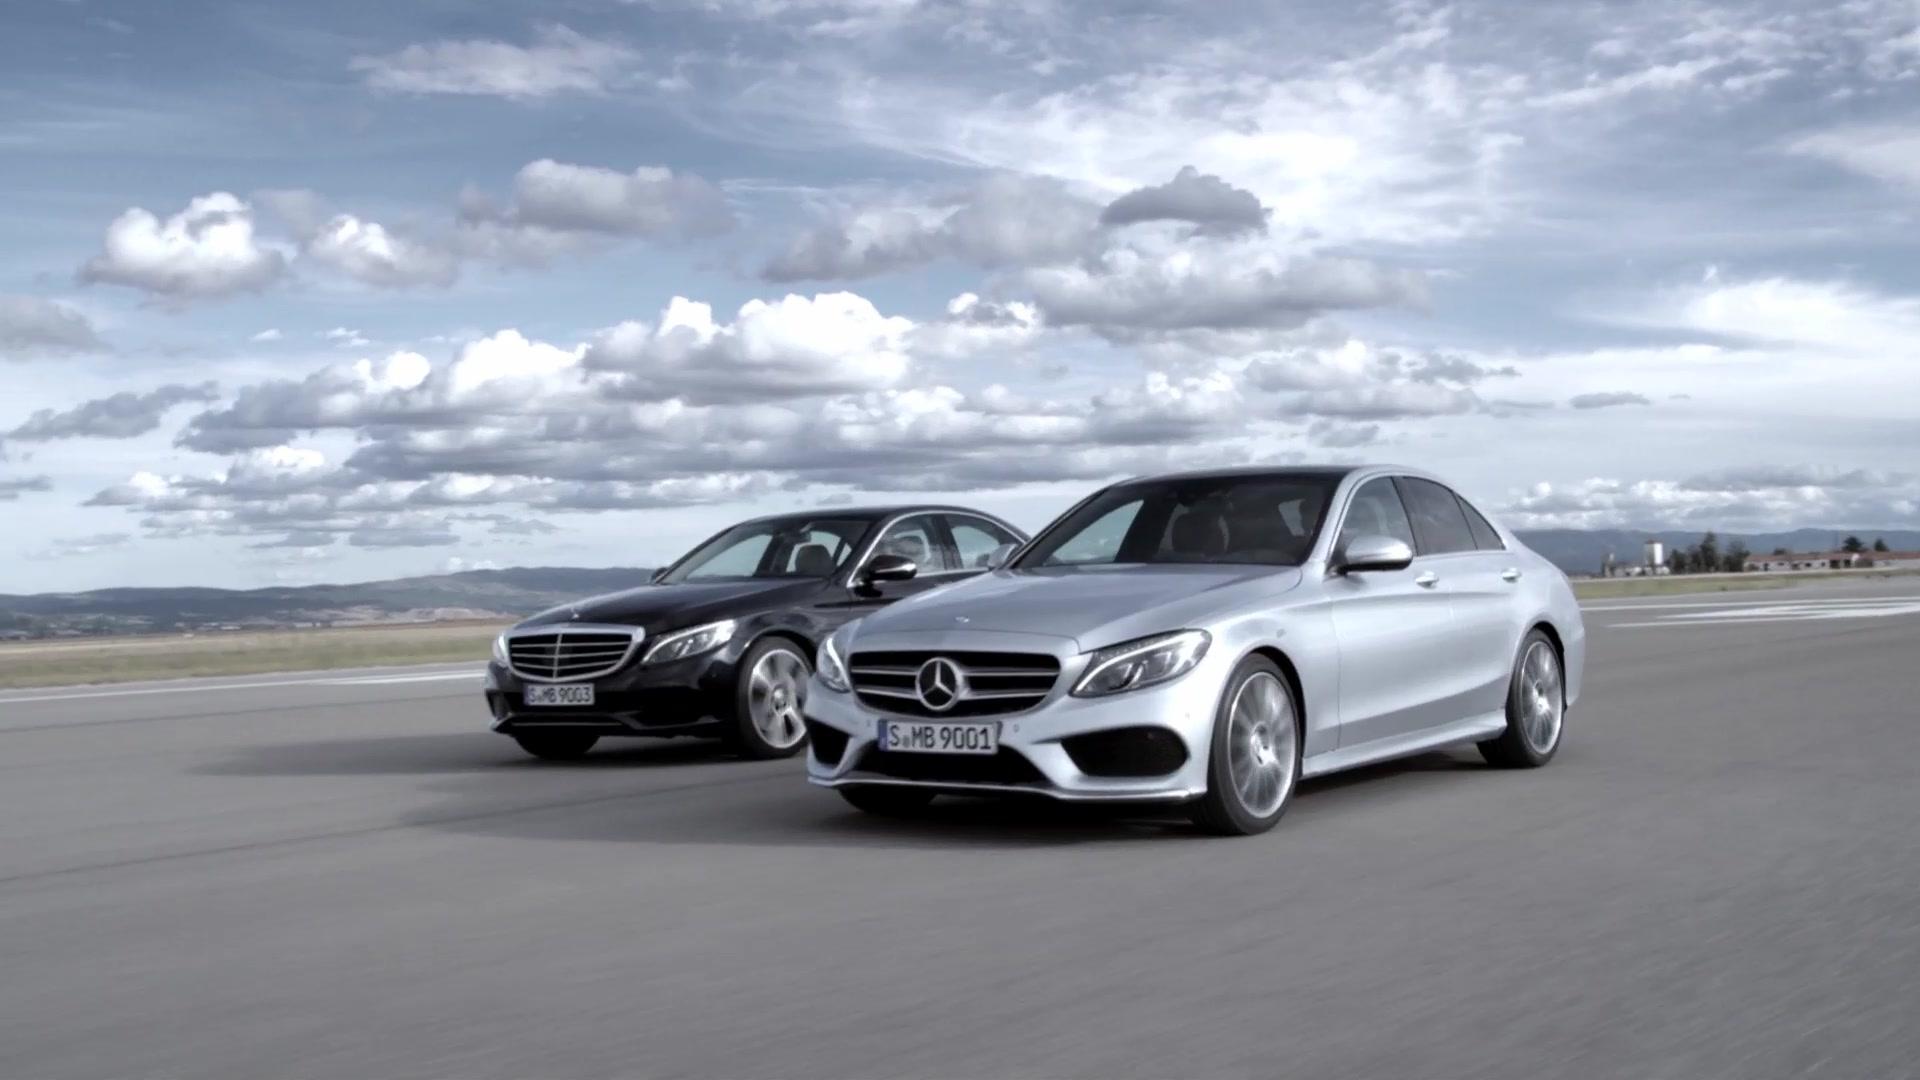 Mercedes-Benz at 2014 Detroit Auto Show